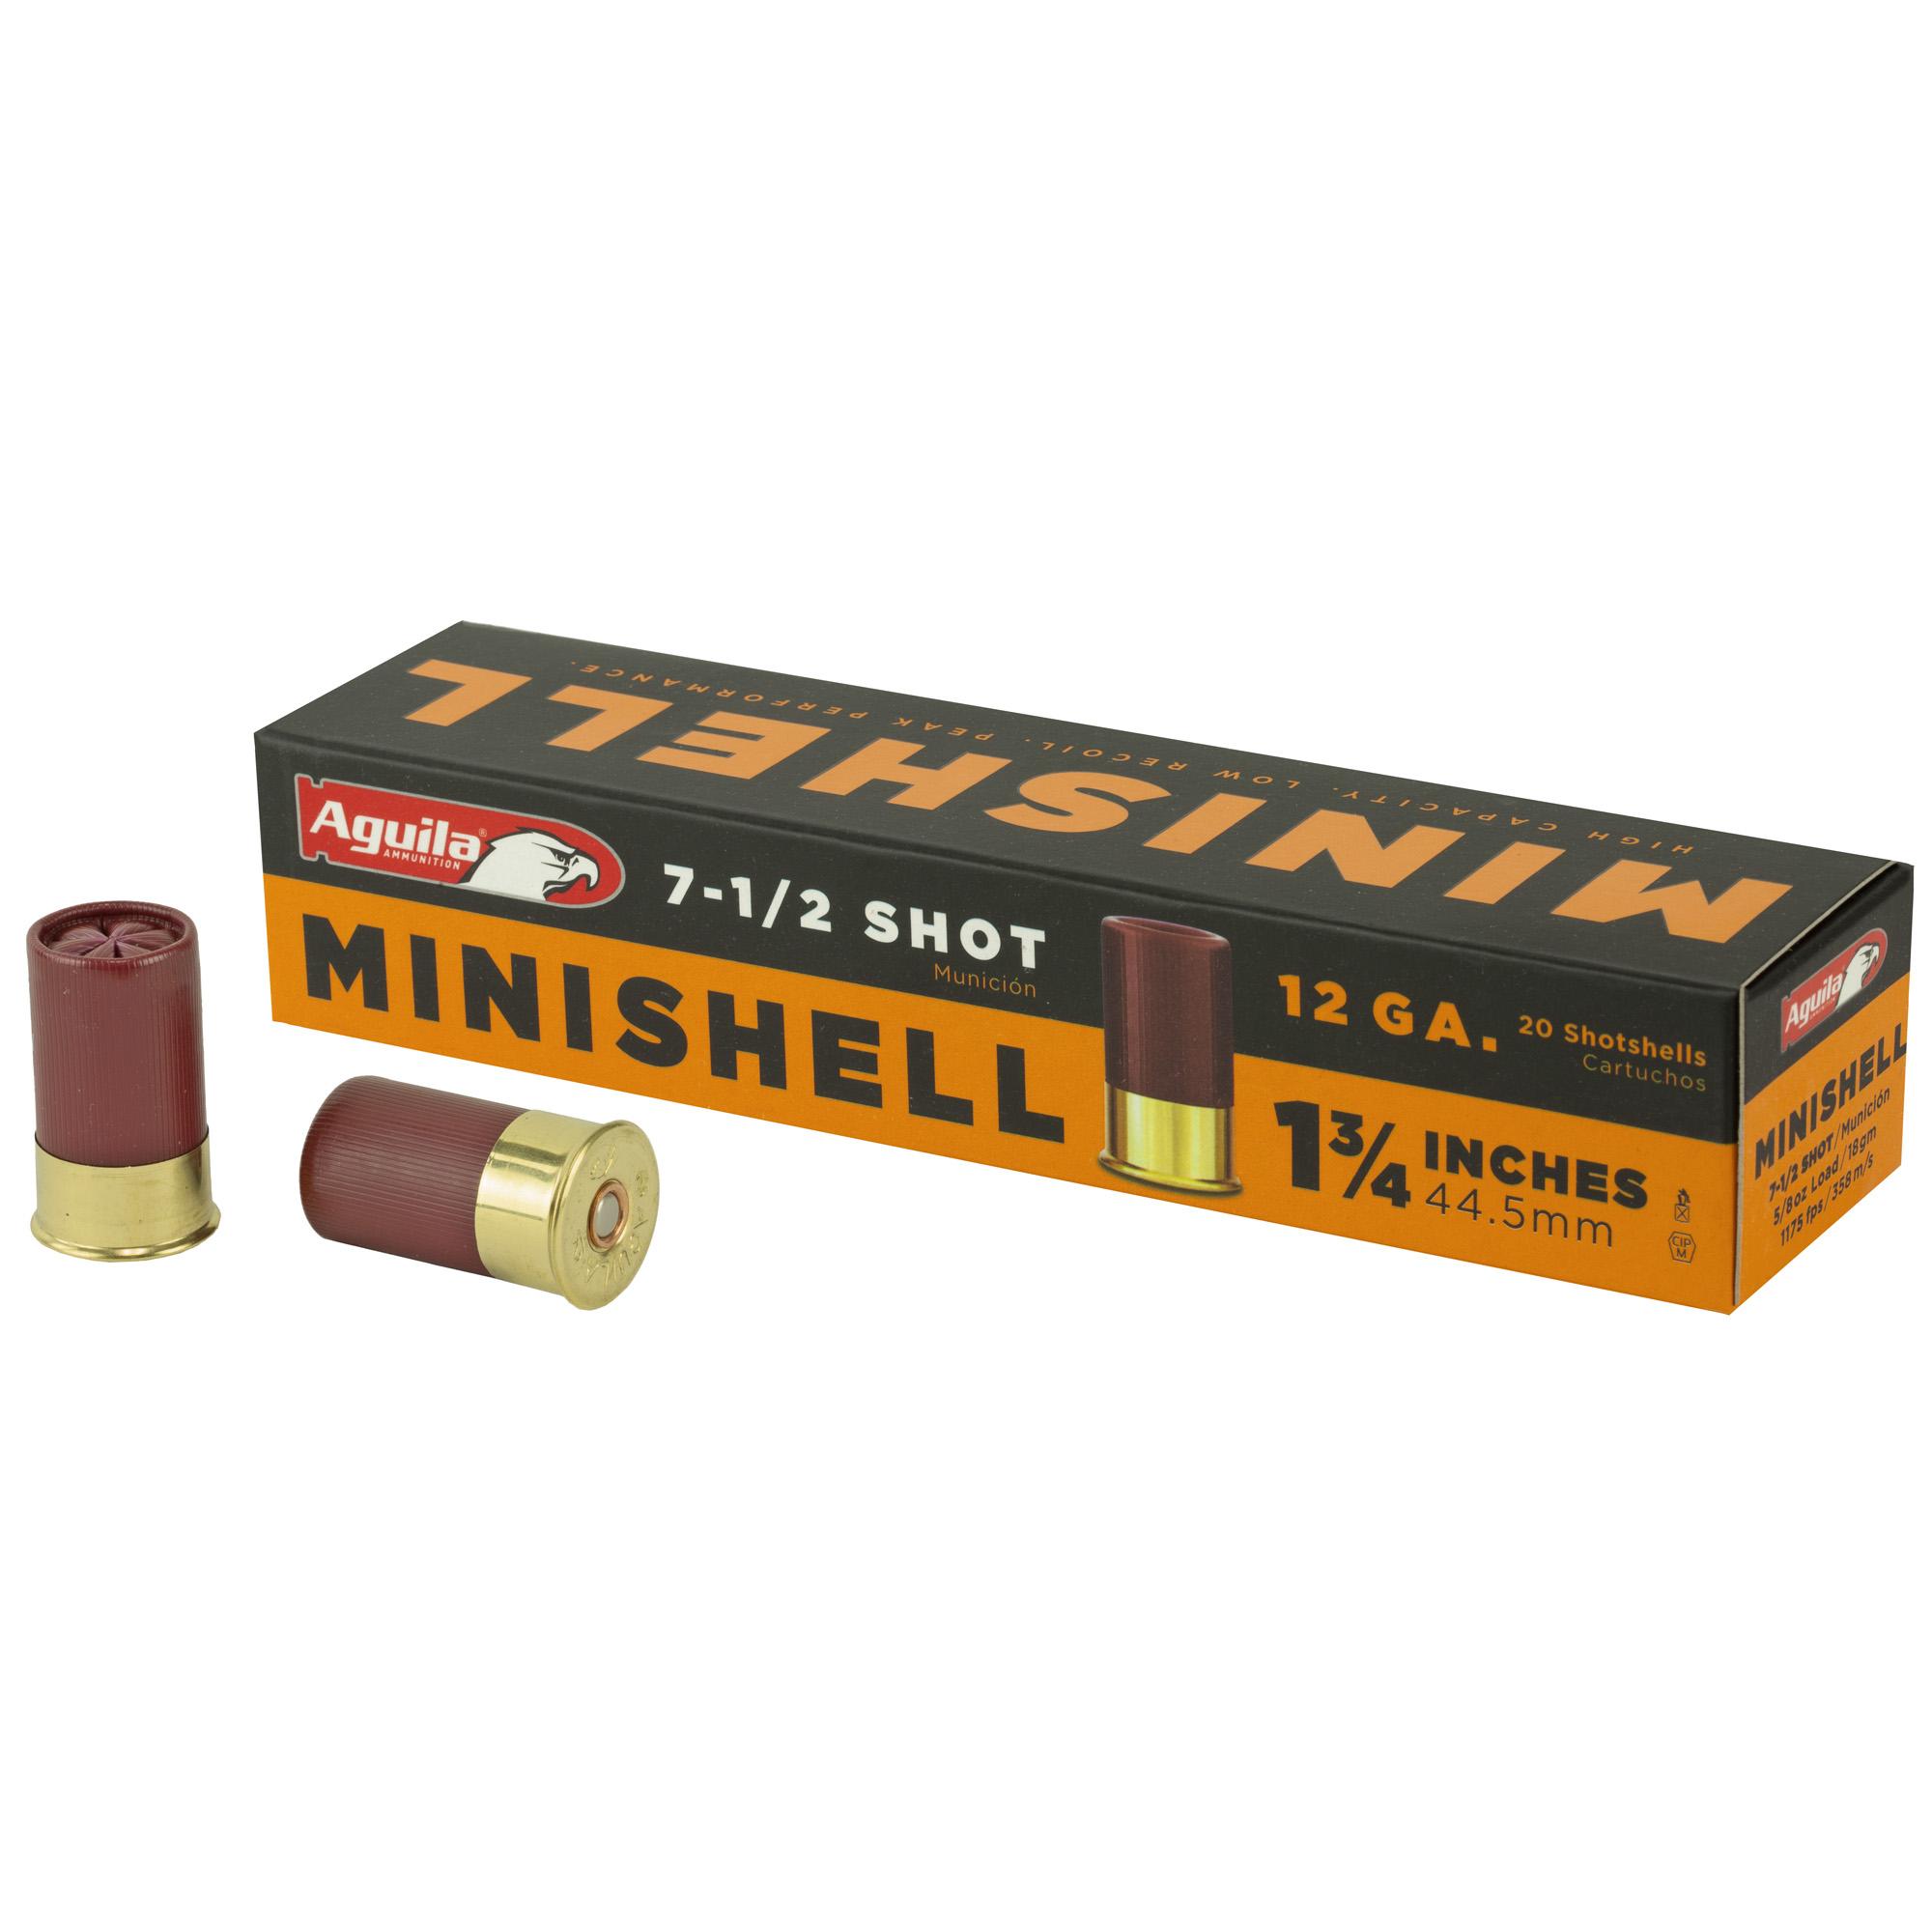 Aguila Minishell 12ga #7.5 20/500